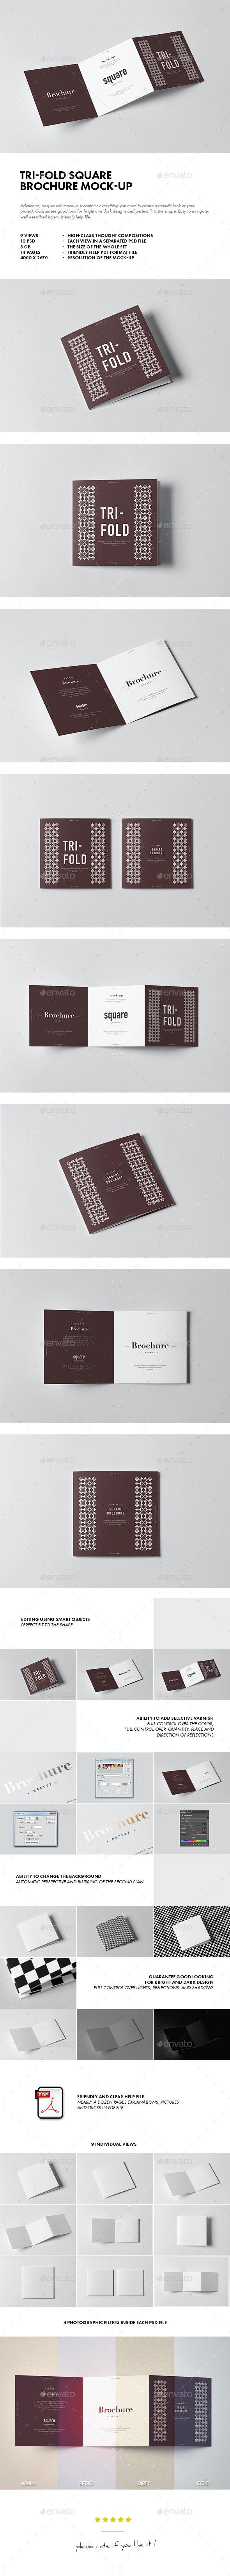 Tri-Fold Square Brochure Mock-up 2 - Brochures Print